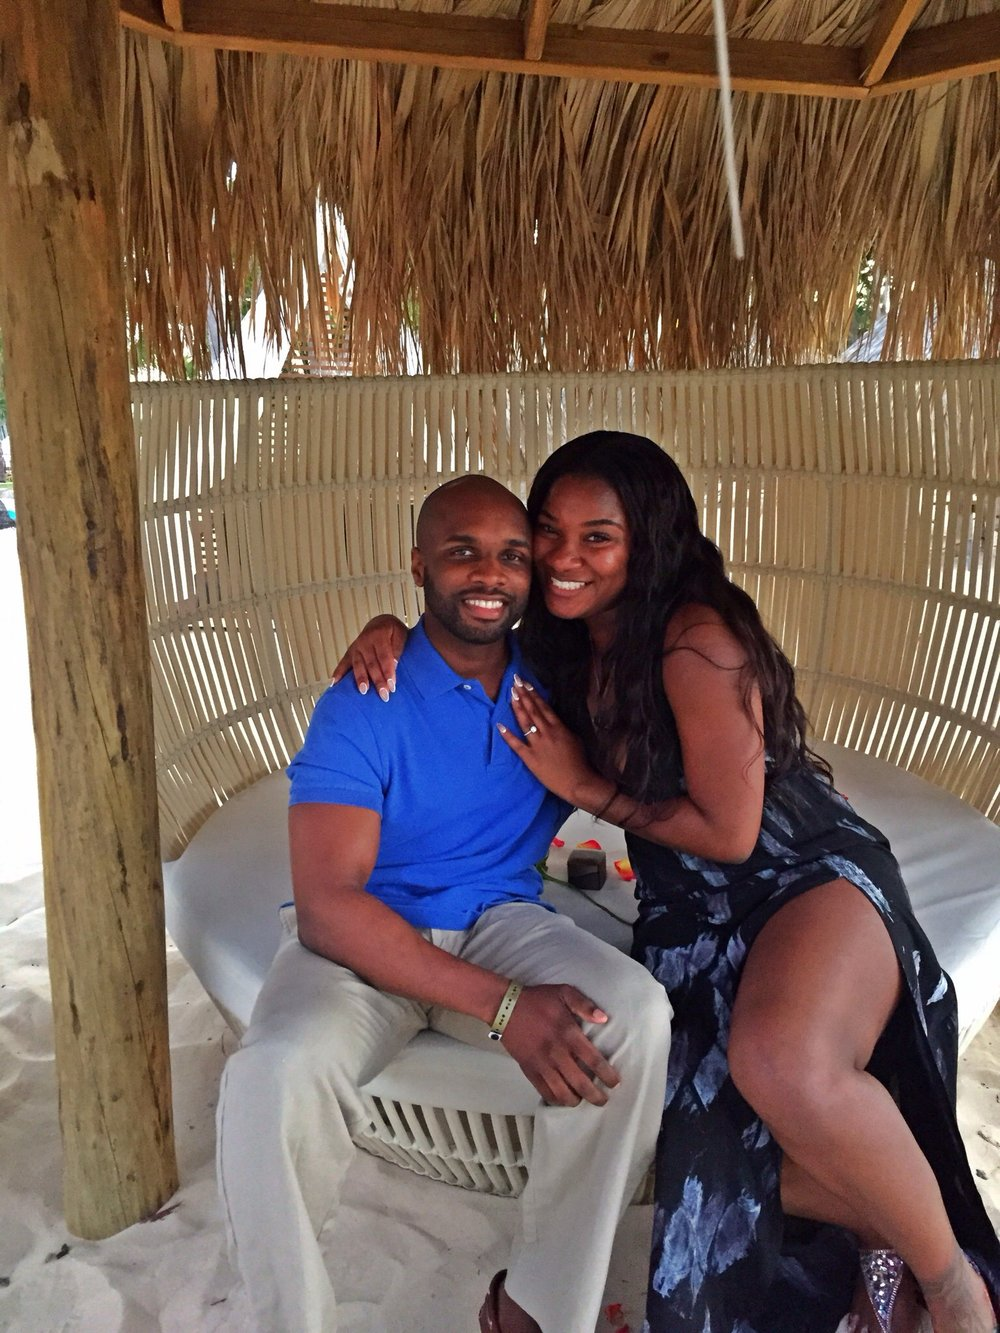 Black Destination Wedding Bride - Enjoying Engagement1.JPG